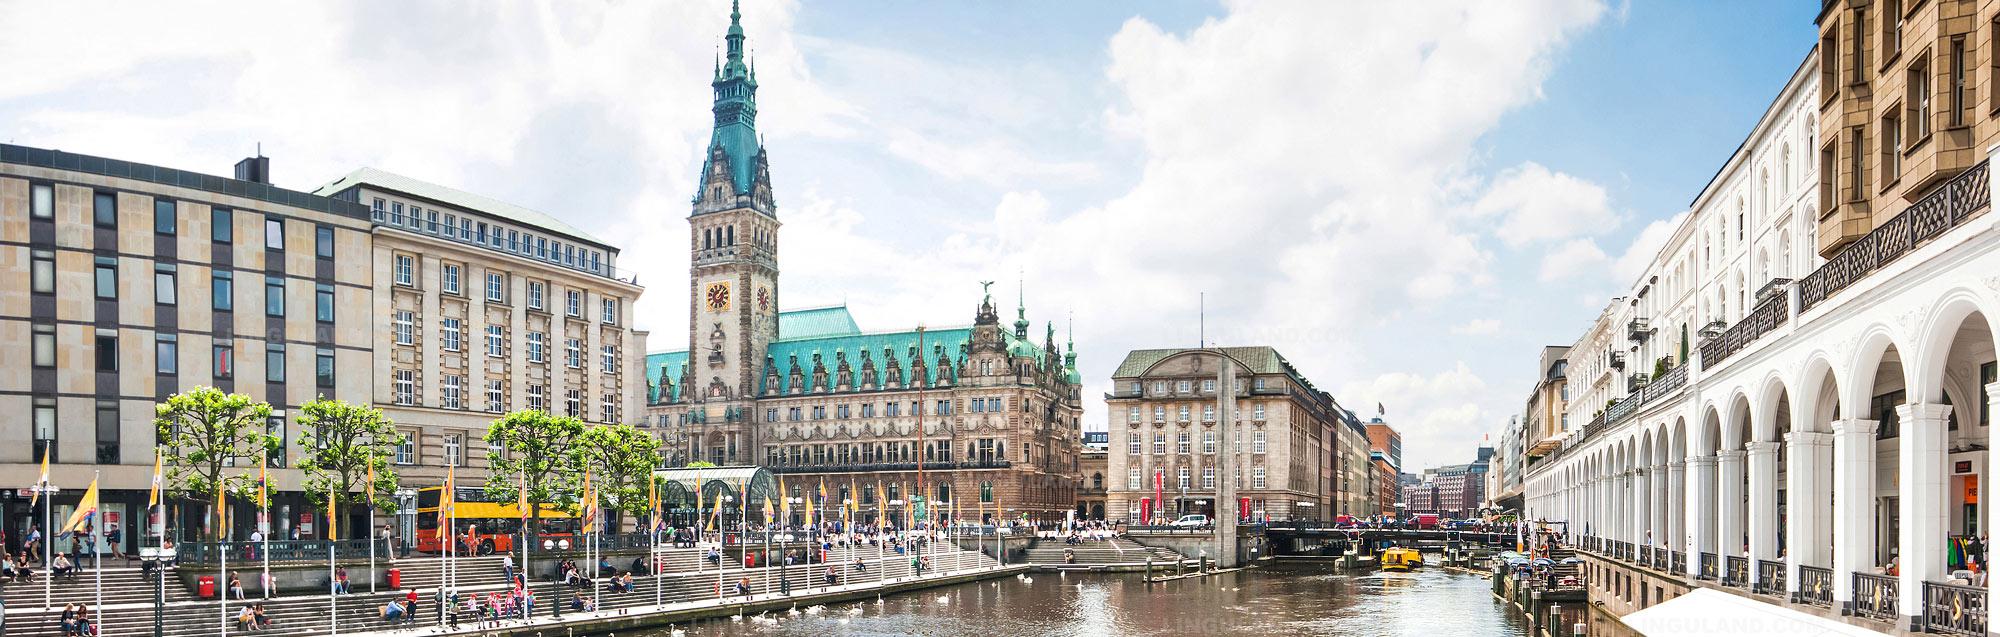 Sprachschulen Hamburg, Sprachkurse Hamburg